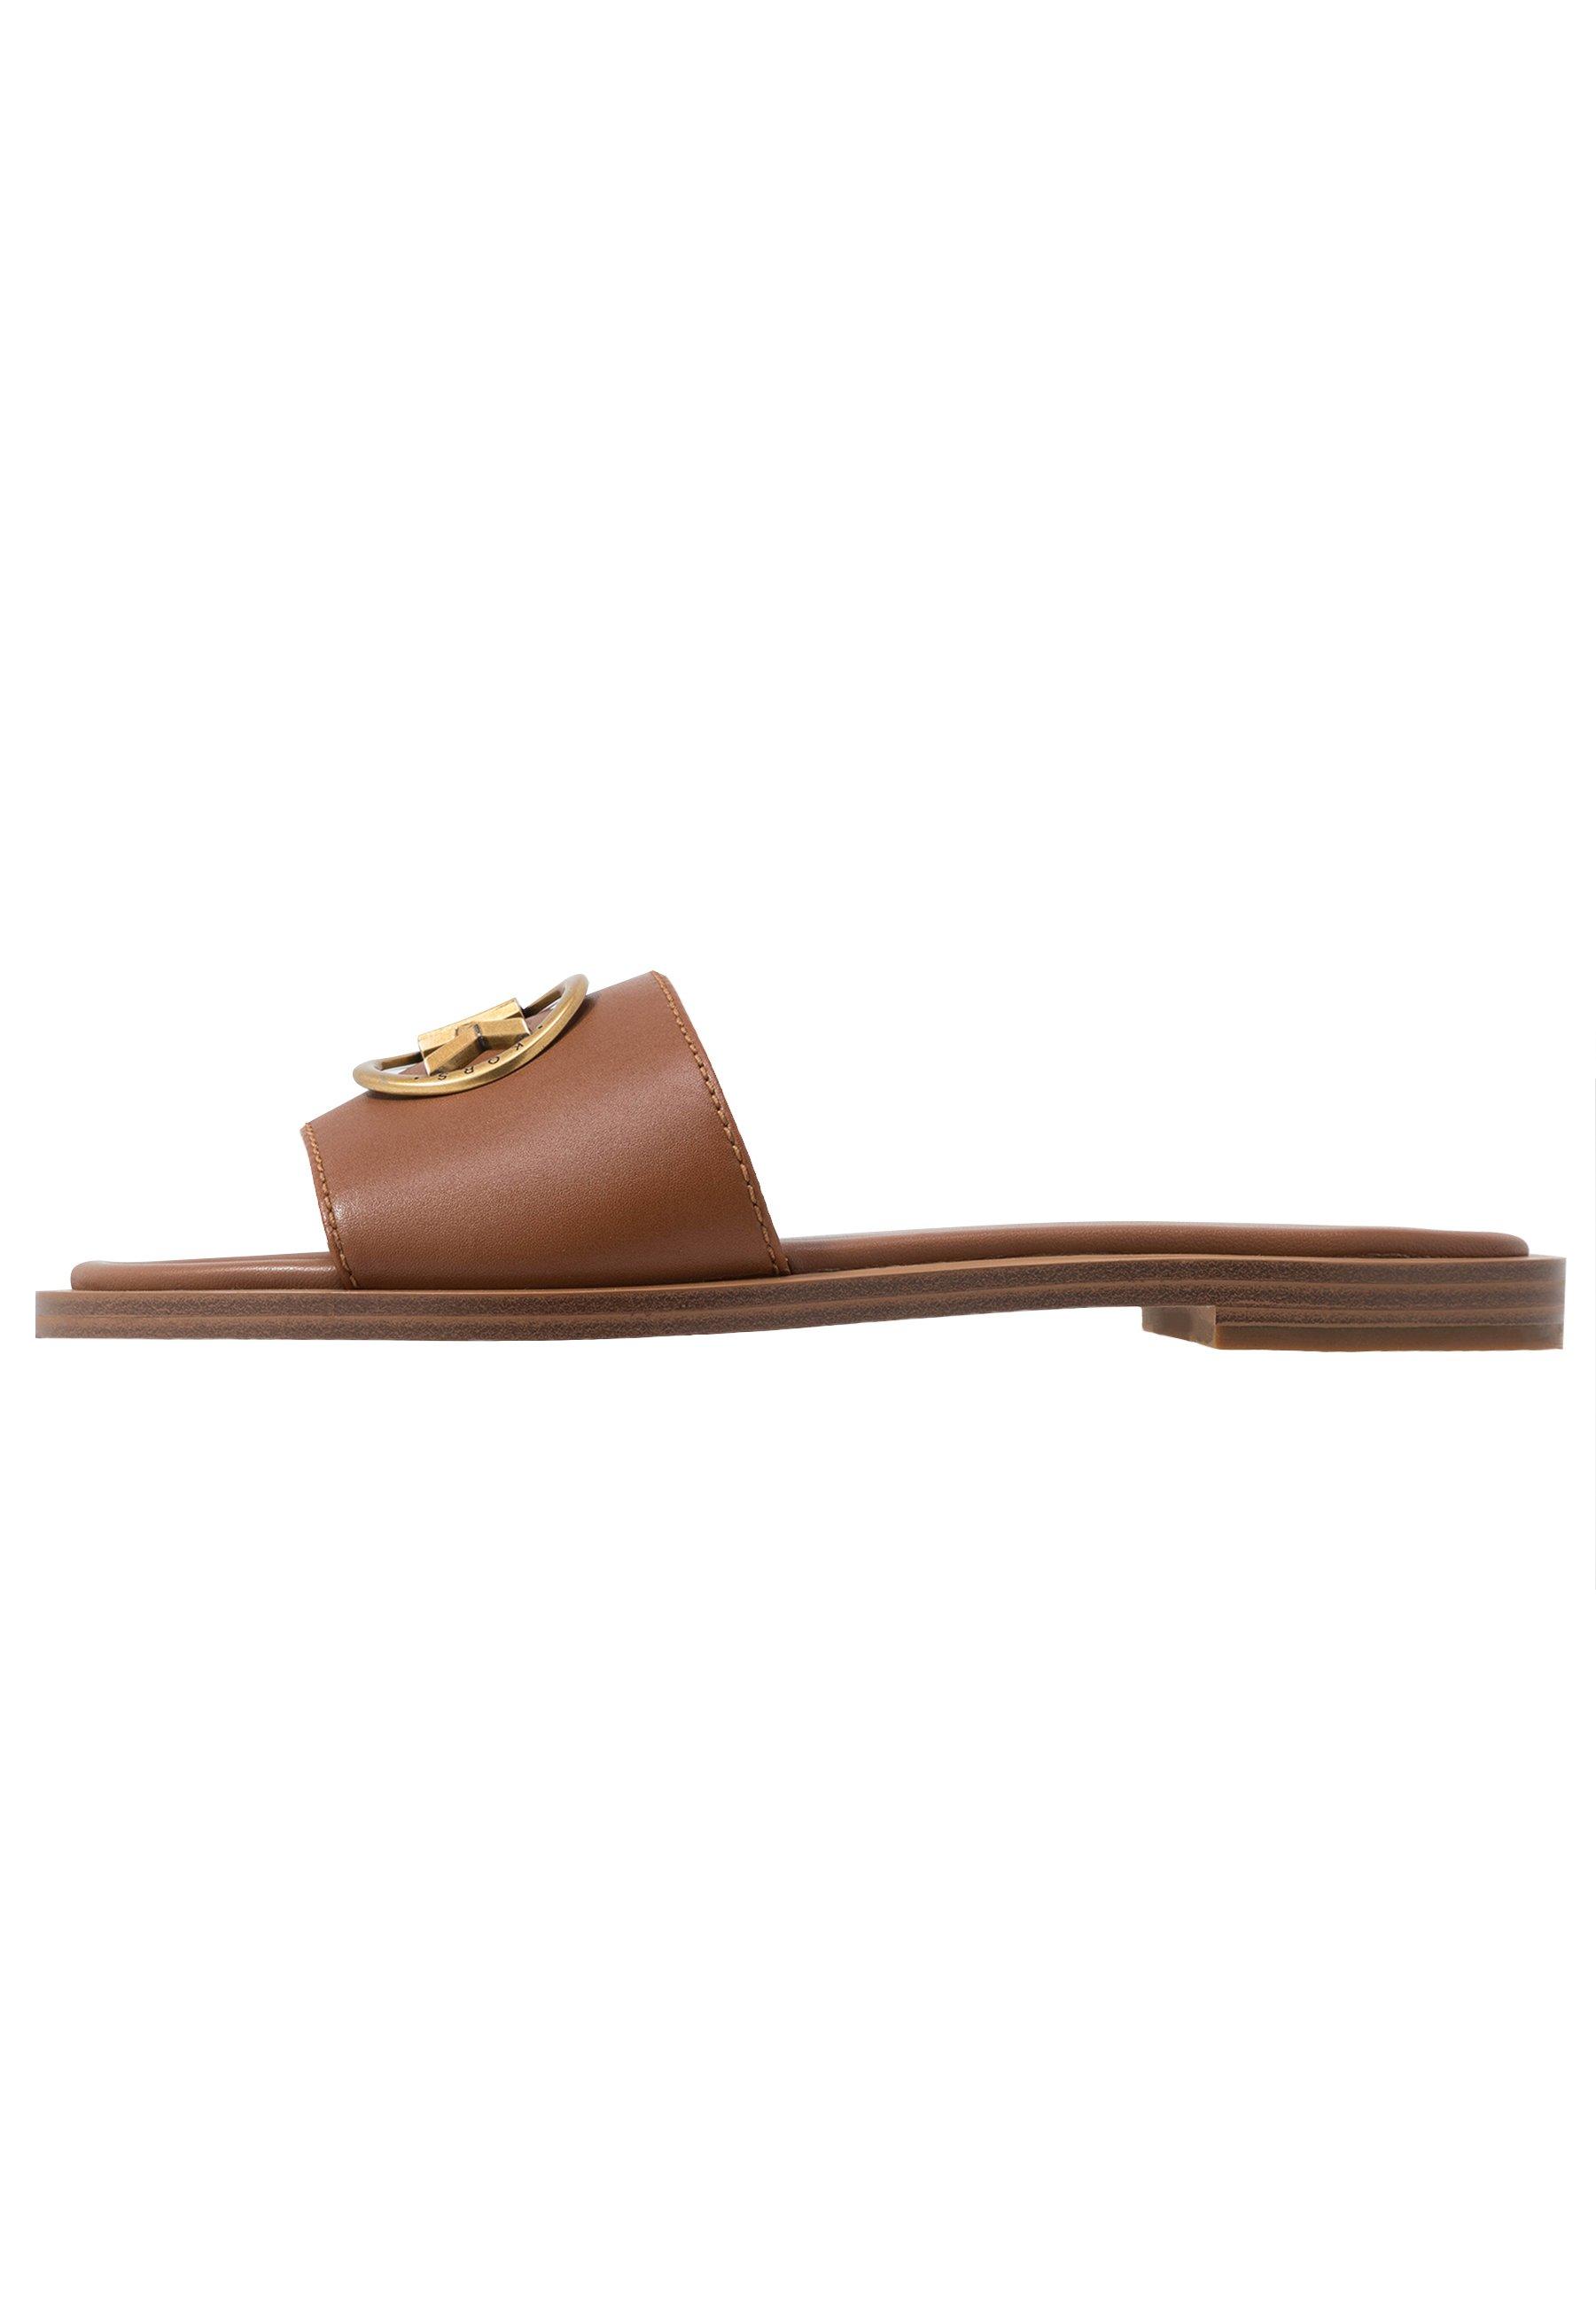 Michael Kors Brynn Slide - Slip-ins Luggage